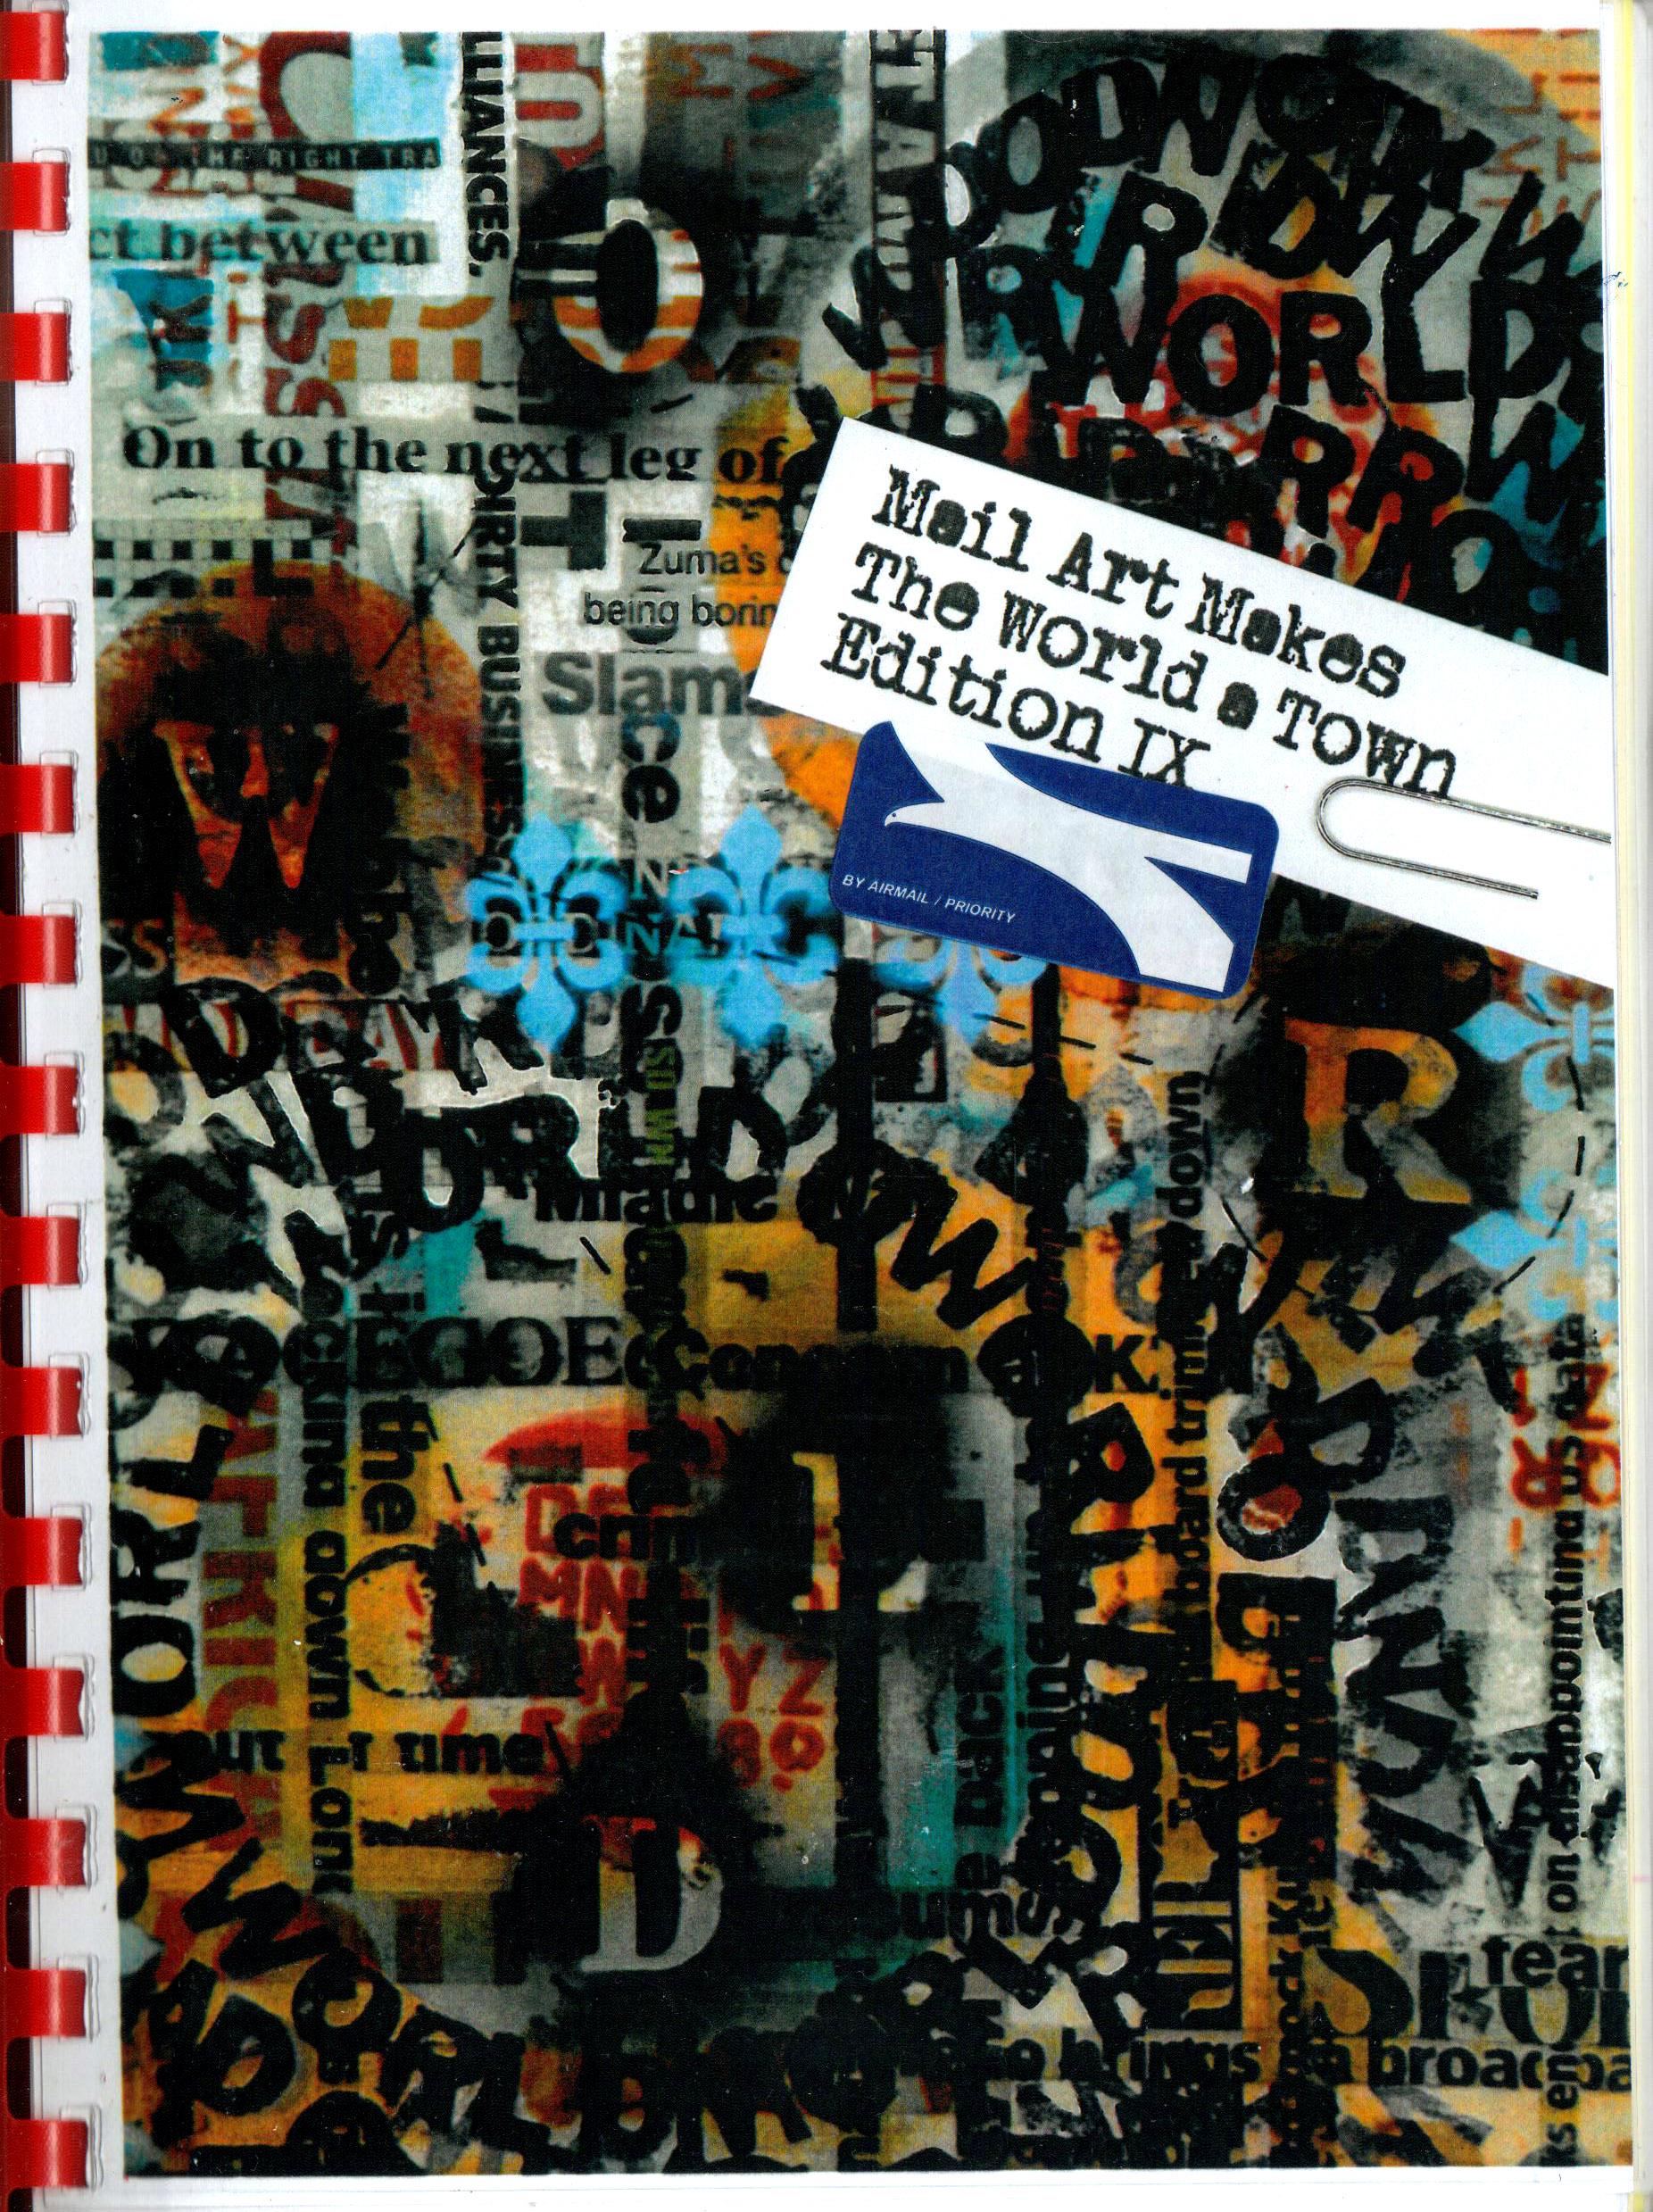 Mail Art Makes The World a Town Edition IX by Cheryl Penn